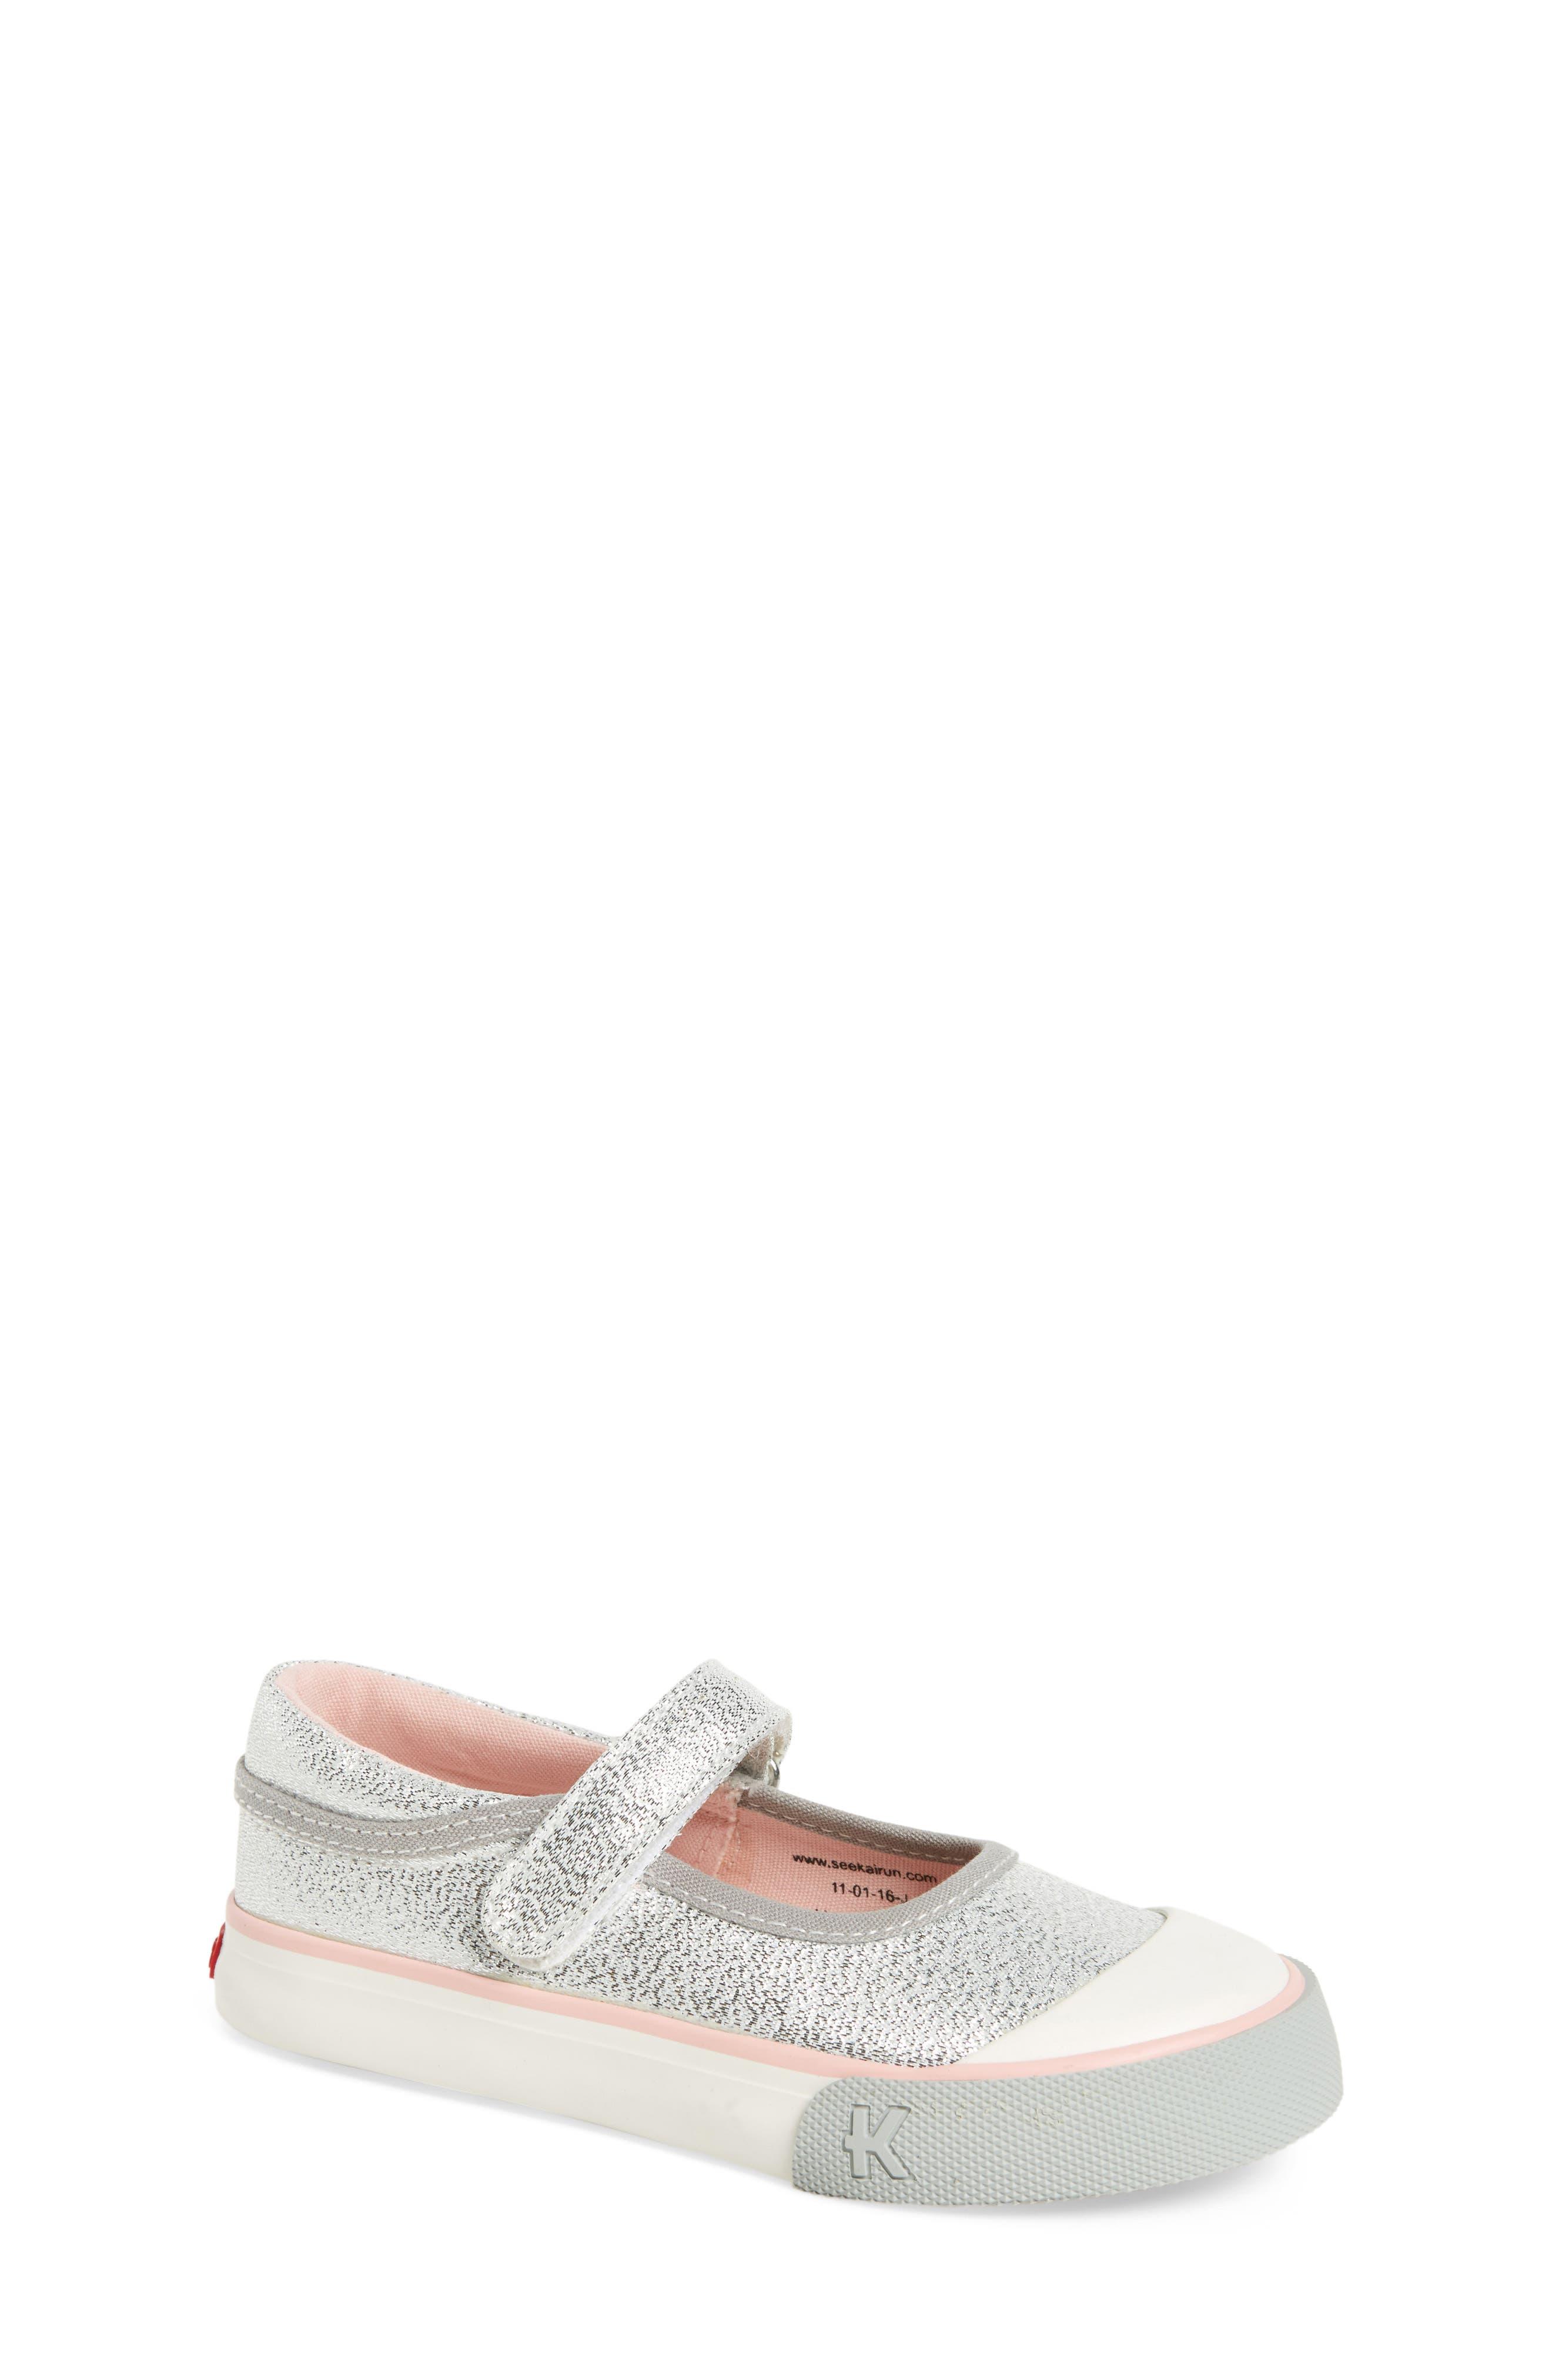 See Kai Run 'Marie' Mary Jane Sneaker (Baby, Walker & Toddler)